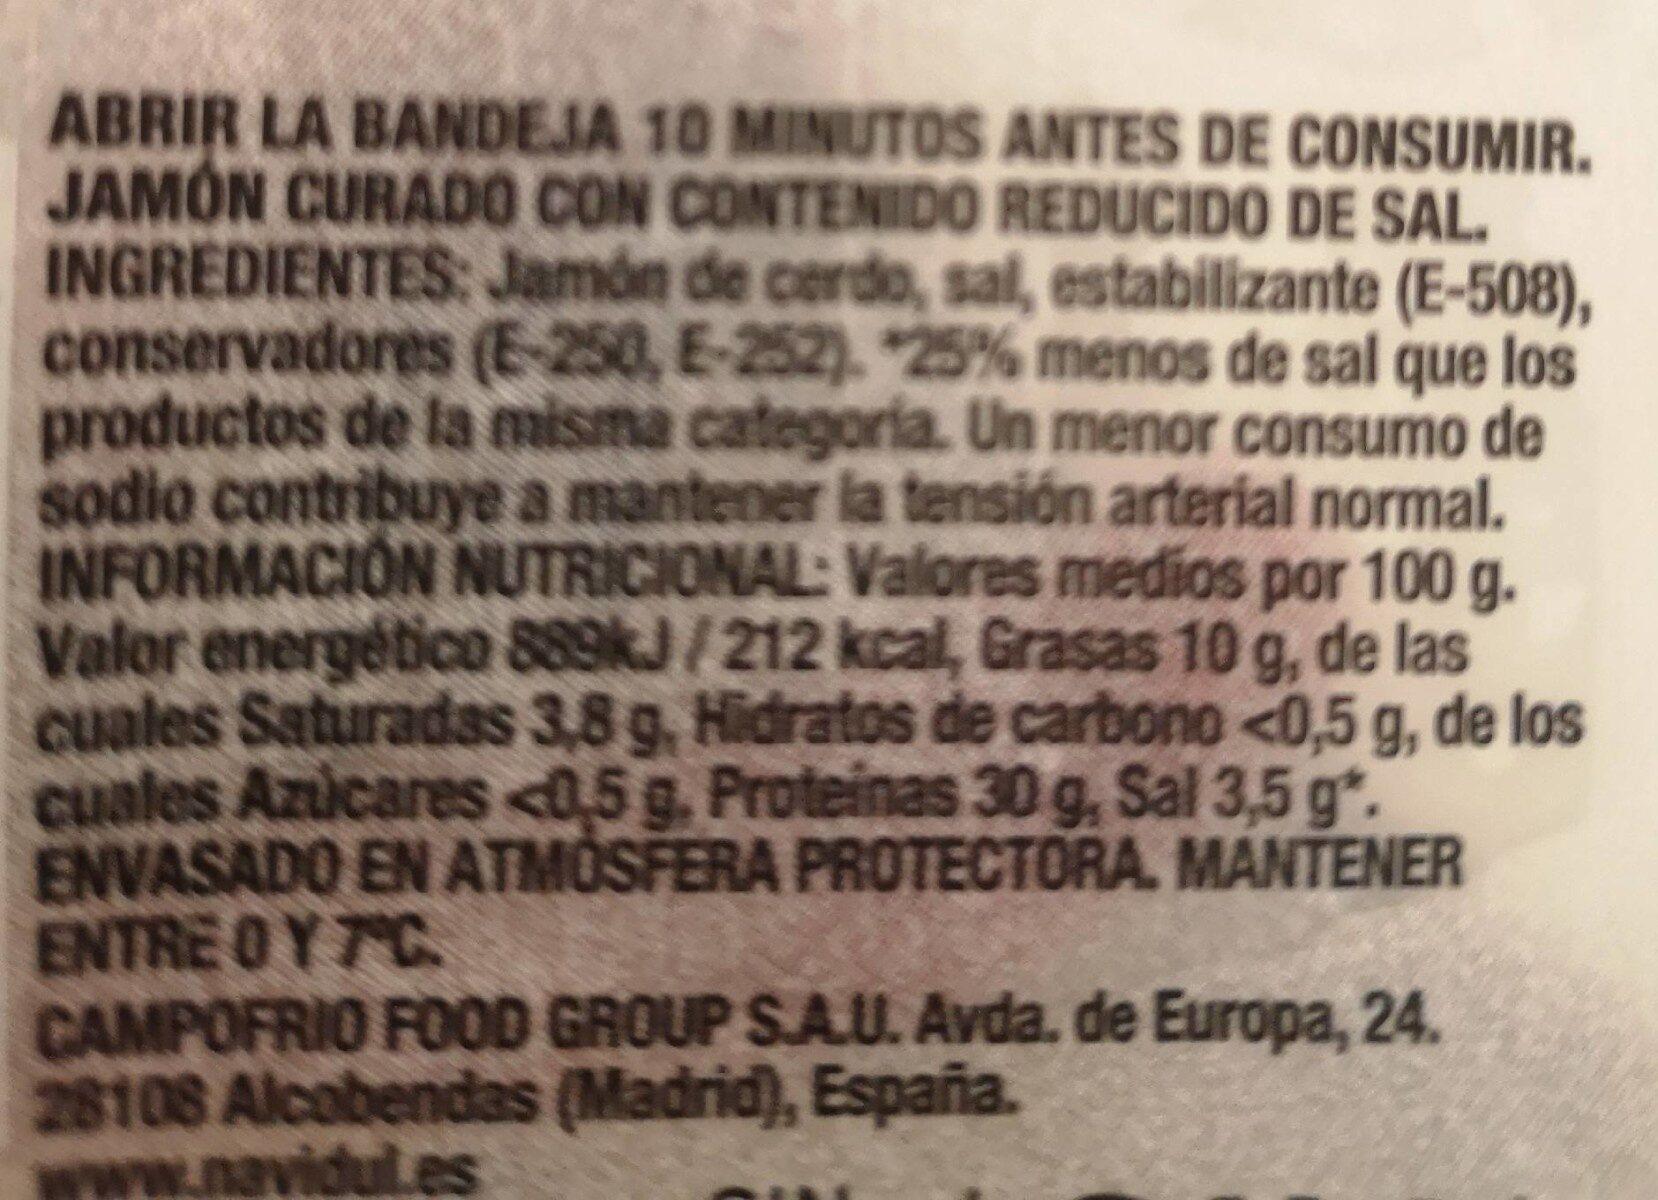 Jamón Curado Lonchas - Información nutricional